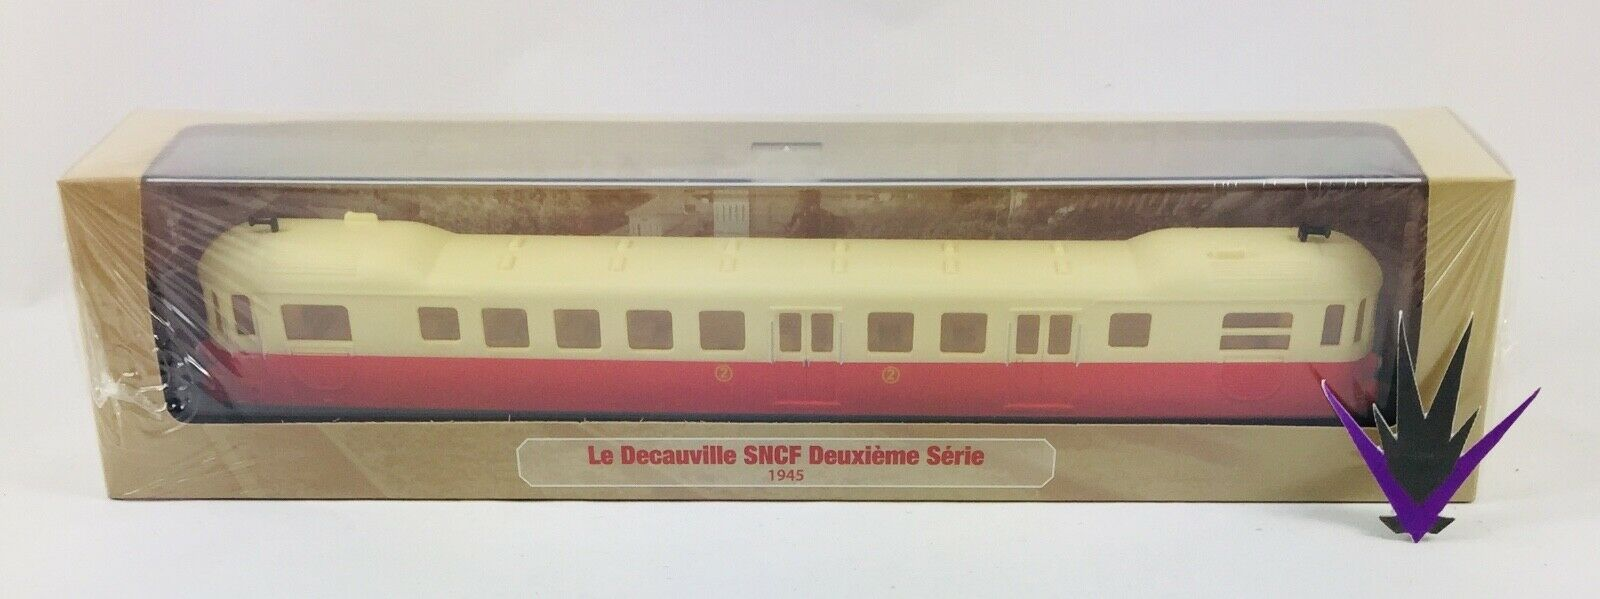 Micheline & Railcar Atlas Ho 1 87 Decauville SNCF Second Series